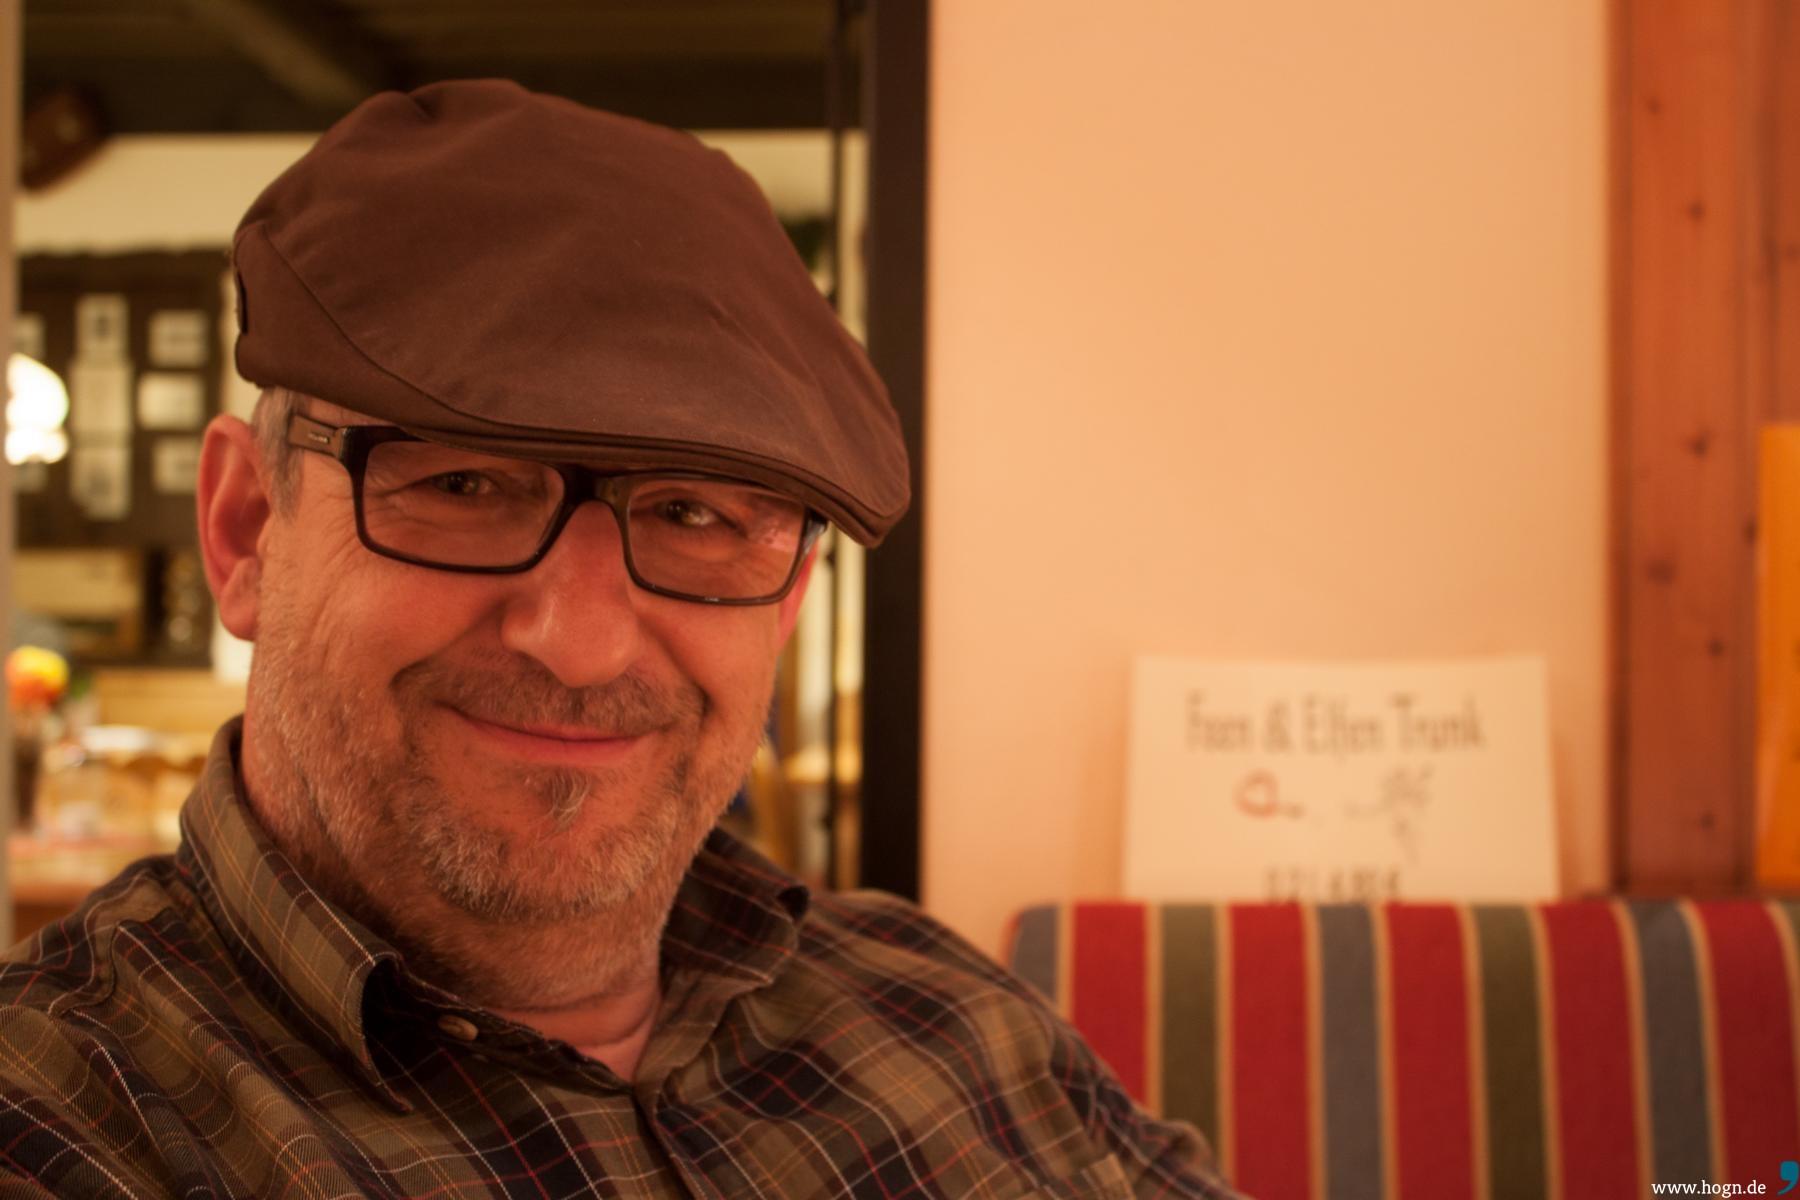 Georg Knaus, 51, Freyung